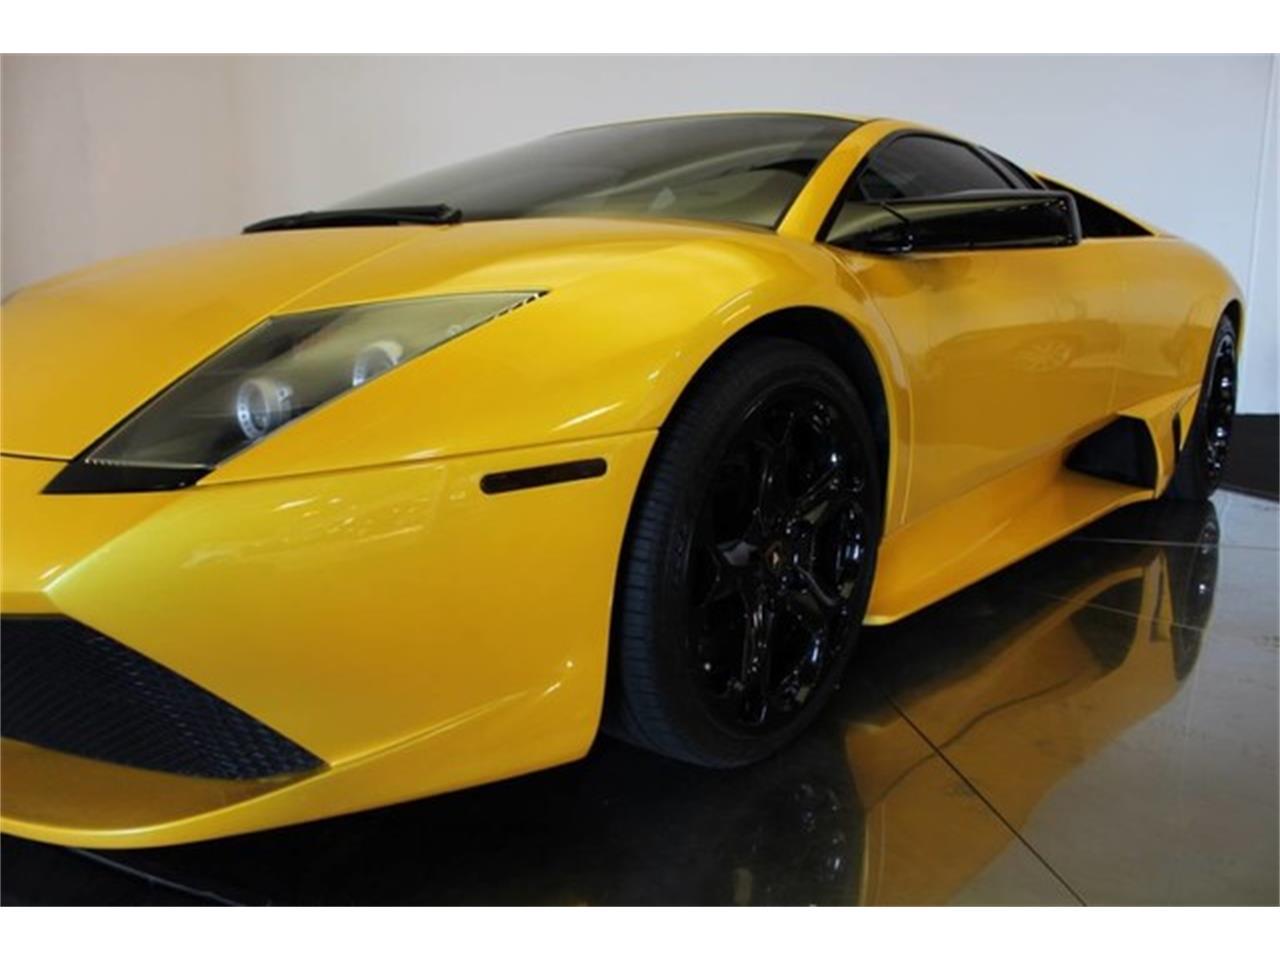 Large Picture of 2007 Lamborghini Murcielago - $165,900.00 Offered by DC Motors - L7IL